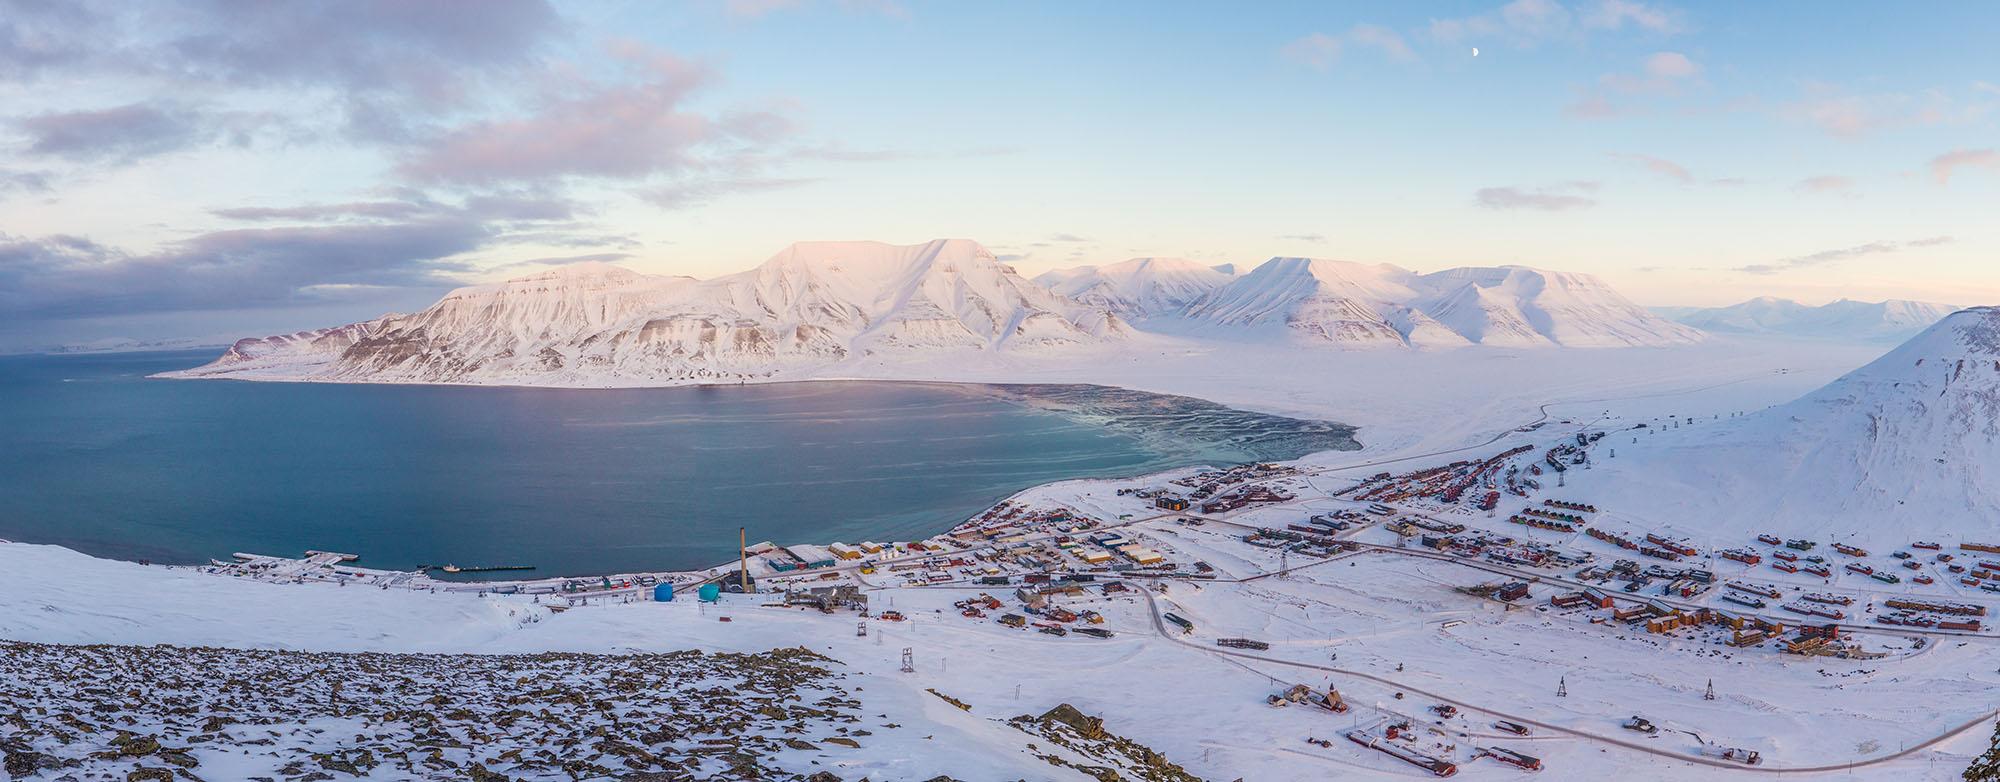 Longyearbyen panorama, Svalbard